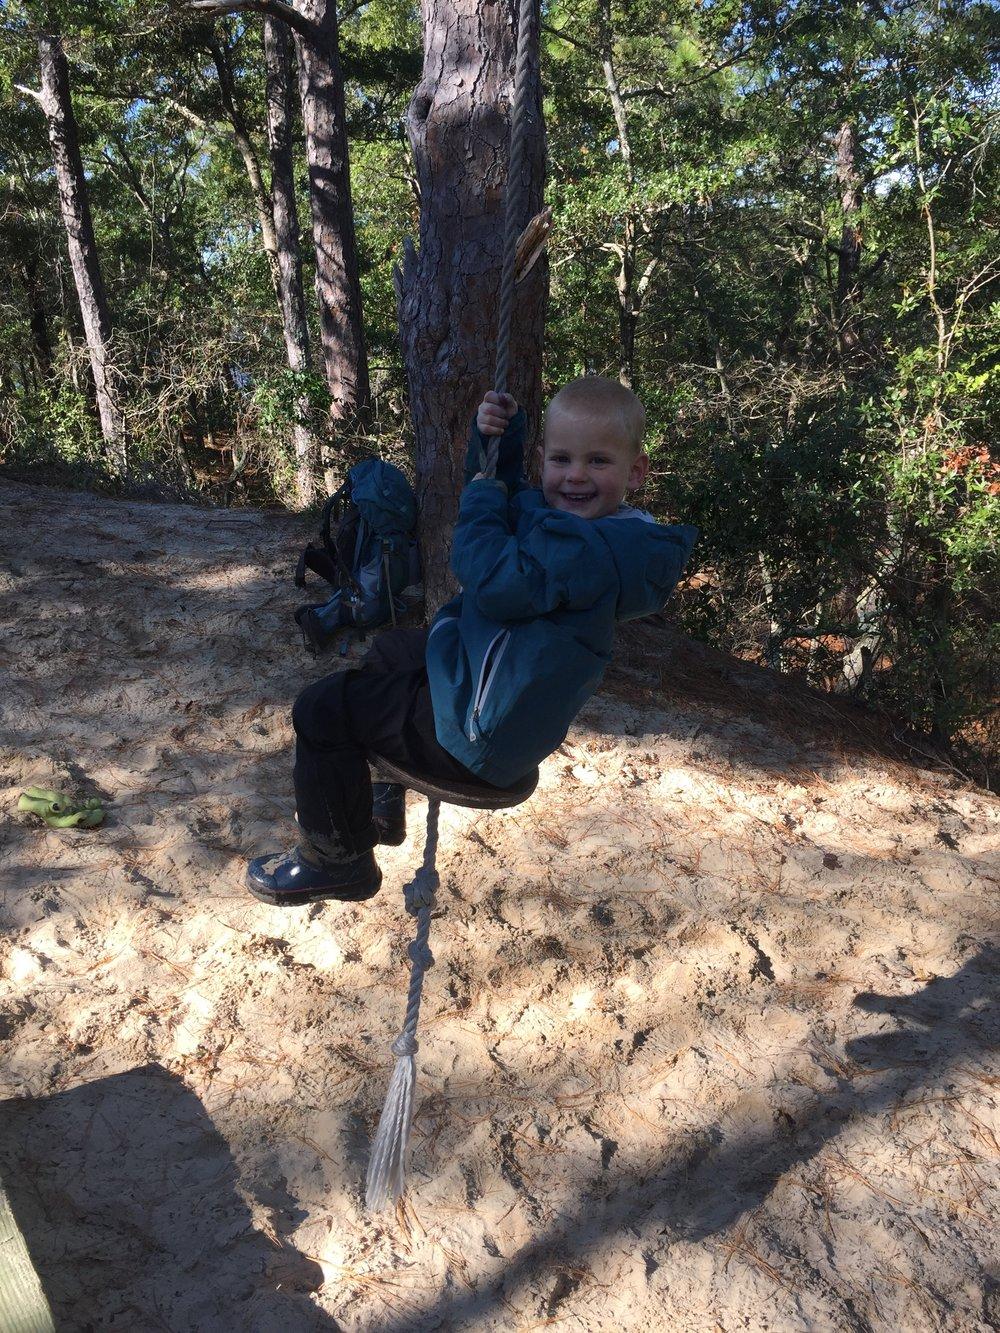 Swingin' on the rope swing!